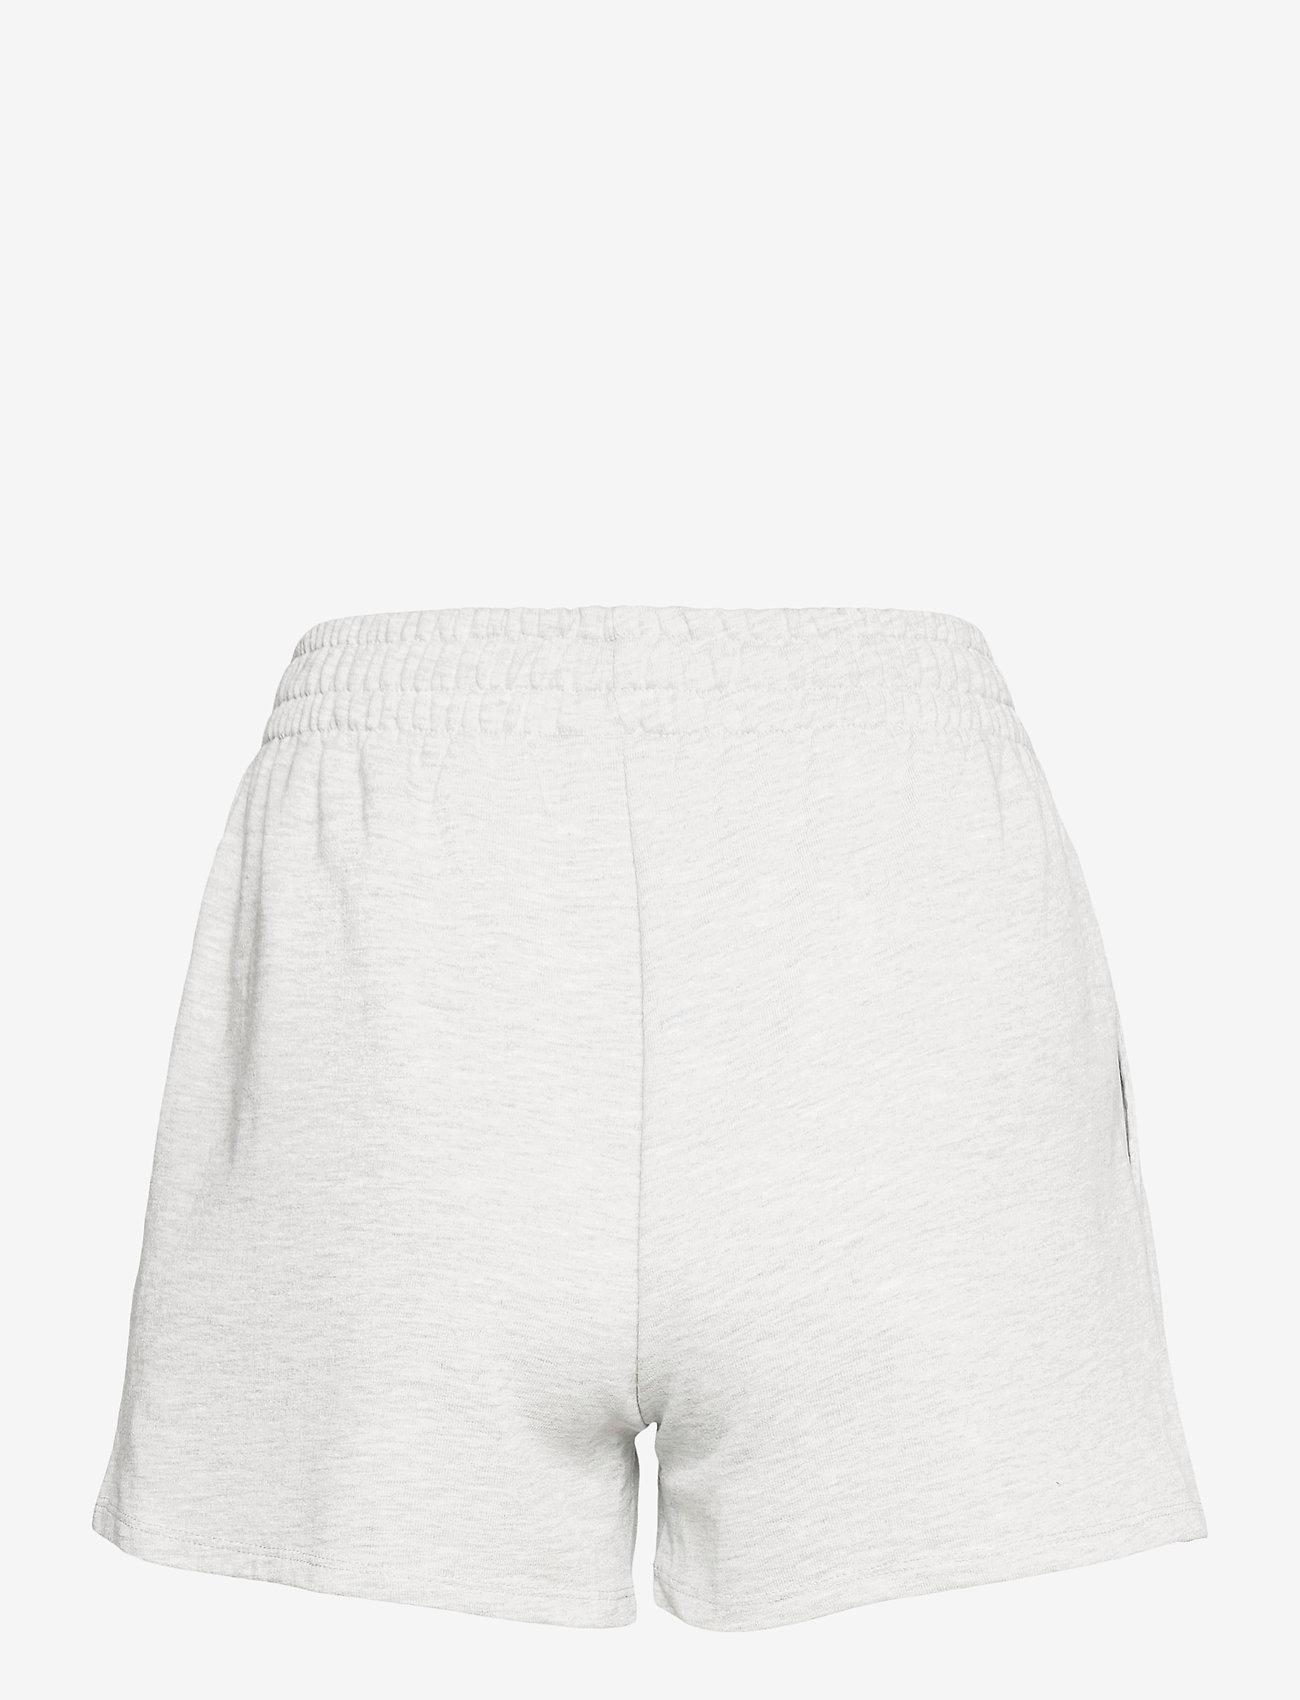 Gina Tricot - Kalyn shorts - shorts casual - lt greymelange (8049) - 1